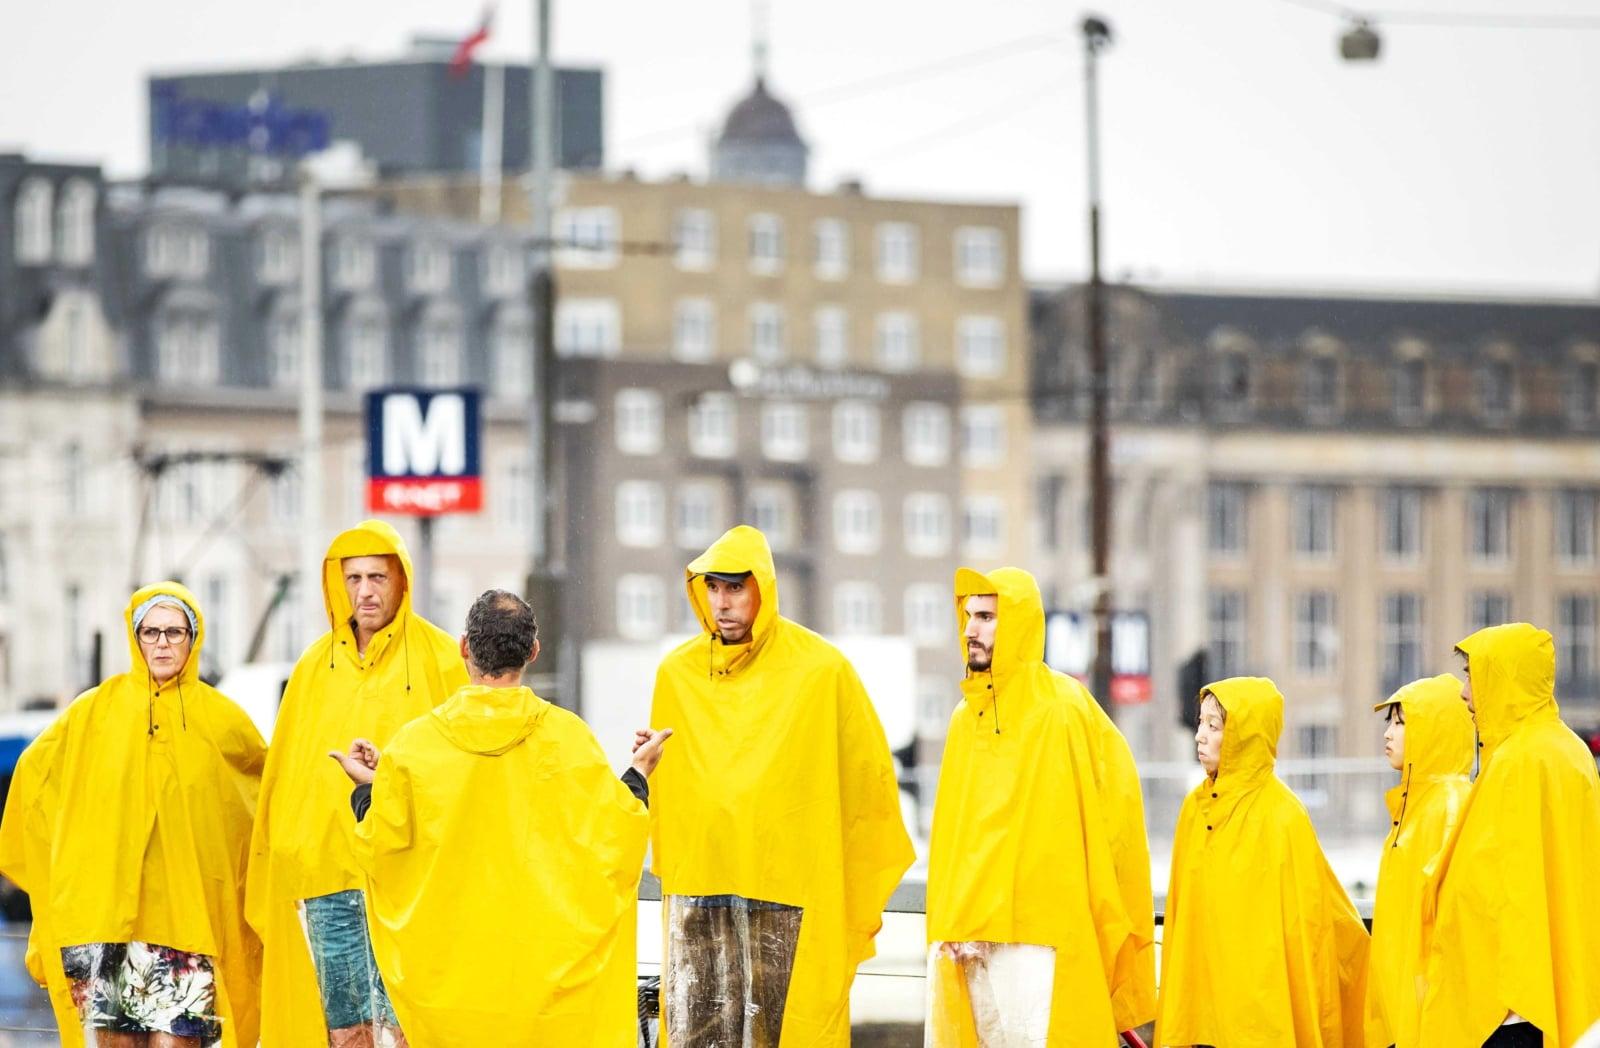 Pogoda w Amsterdamie fot. EPA/REMKO DE WAAL